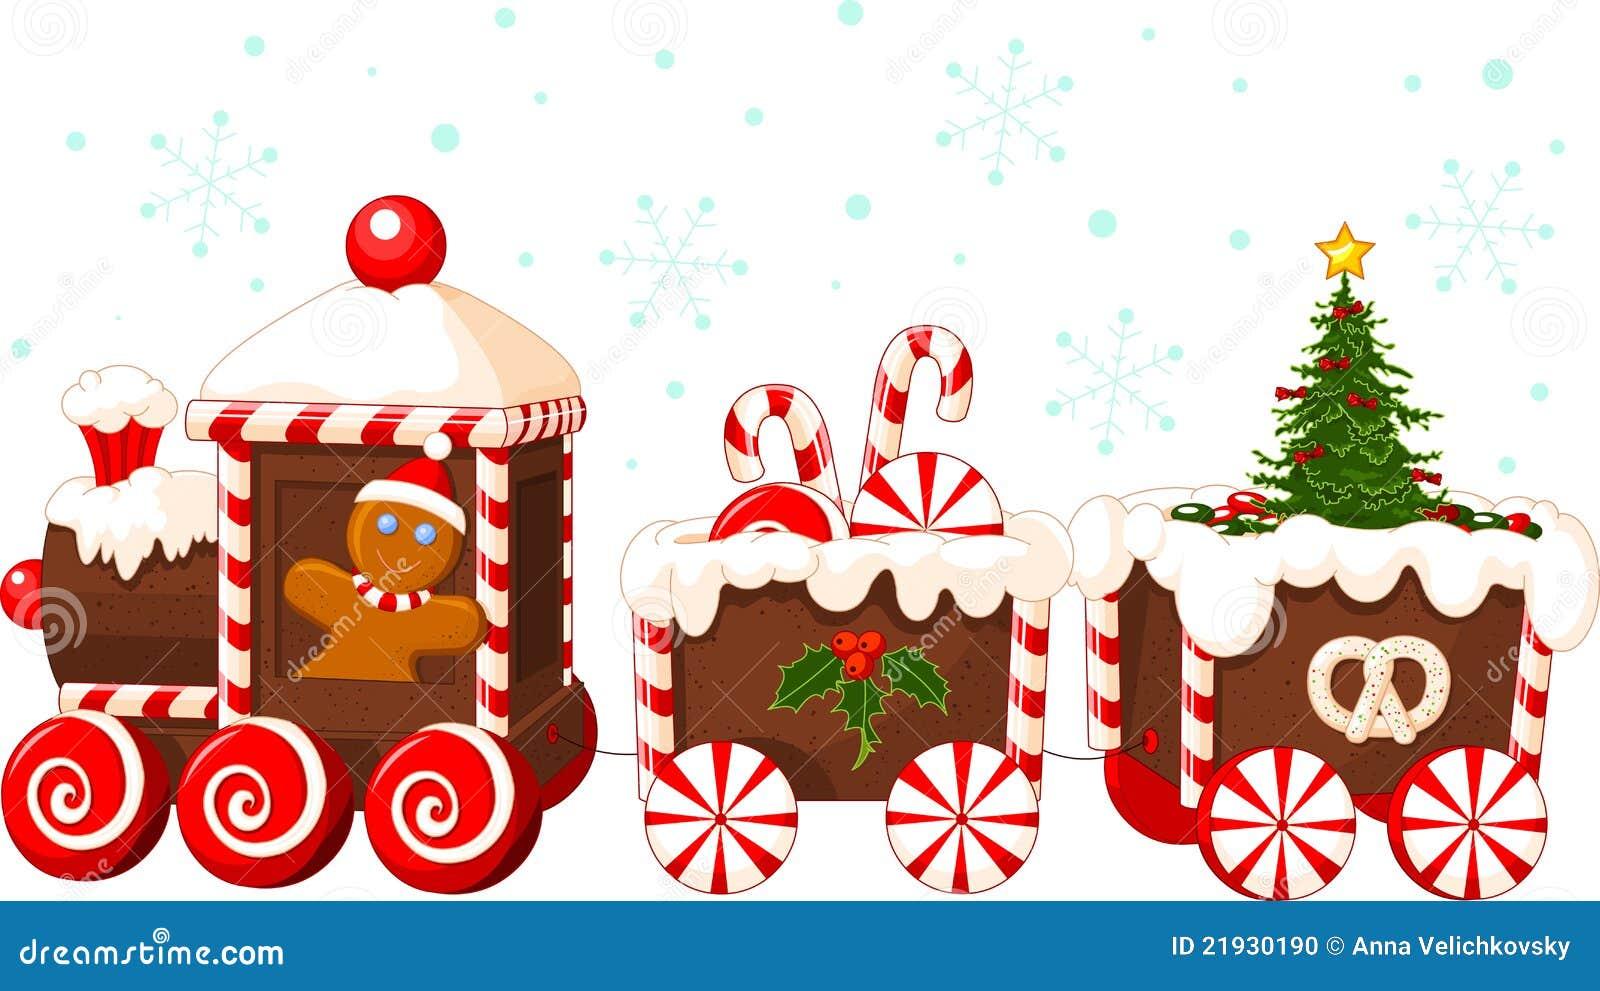 Christmas train stock vector. Illustration of steam, symbol - 21930190